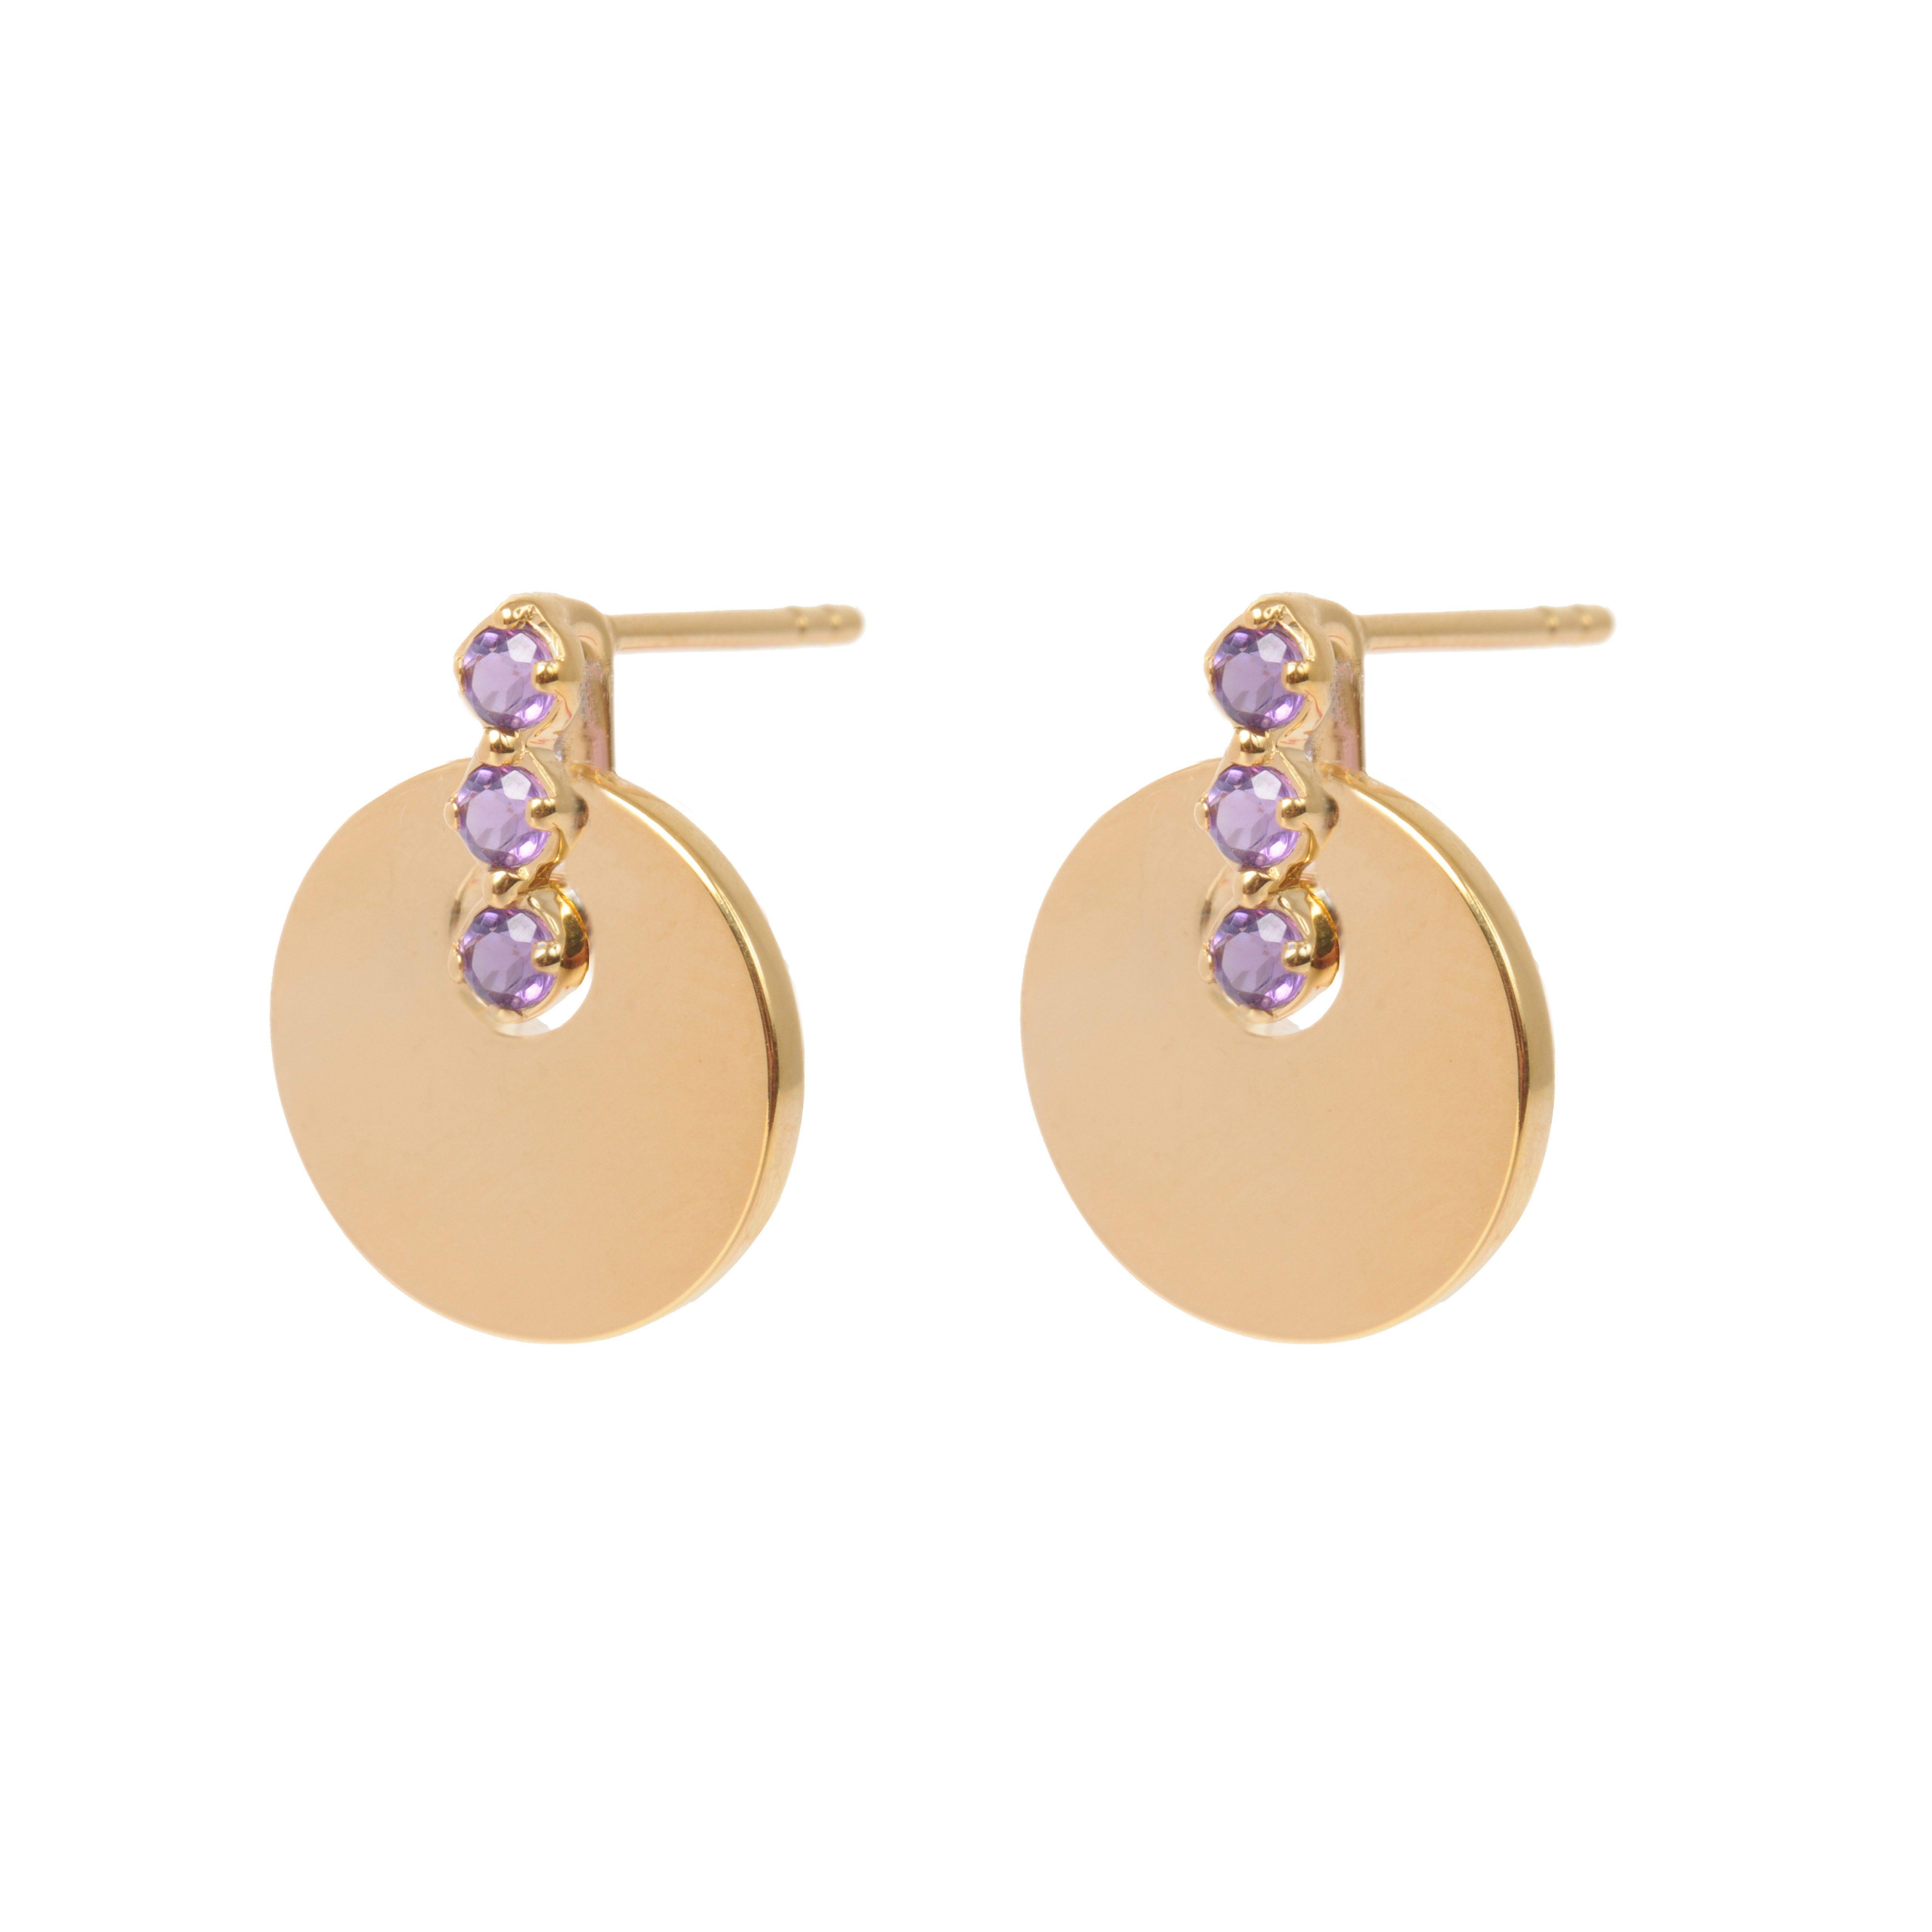 e6722b953 Amethyst Sienna Disc Earrings | The SIENNA Collection | Earrings ...